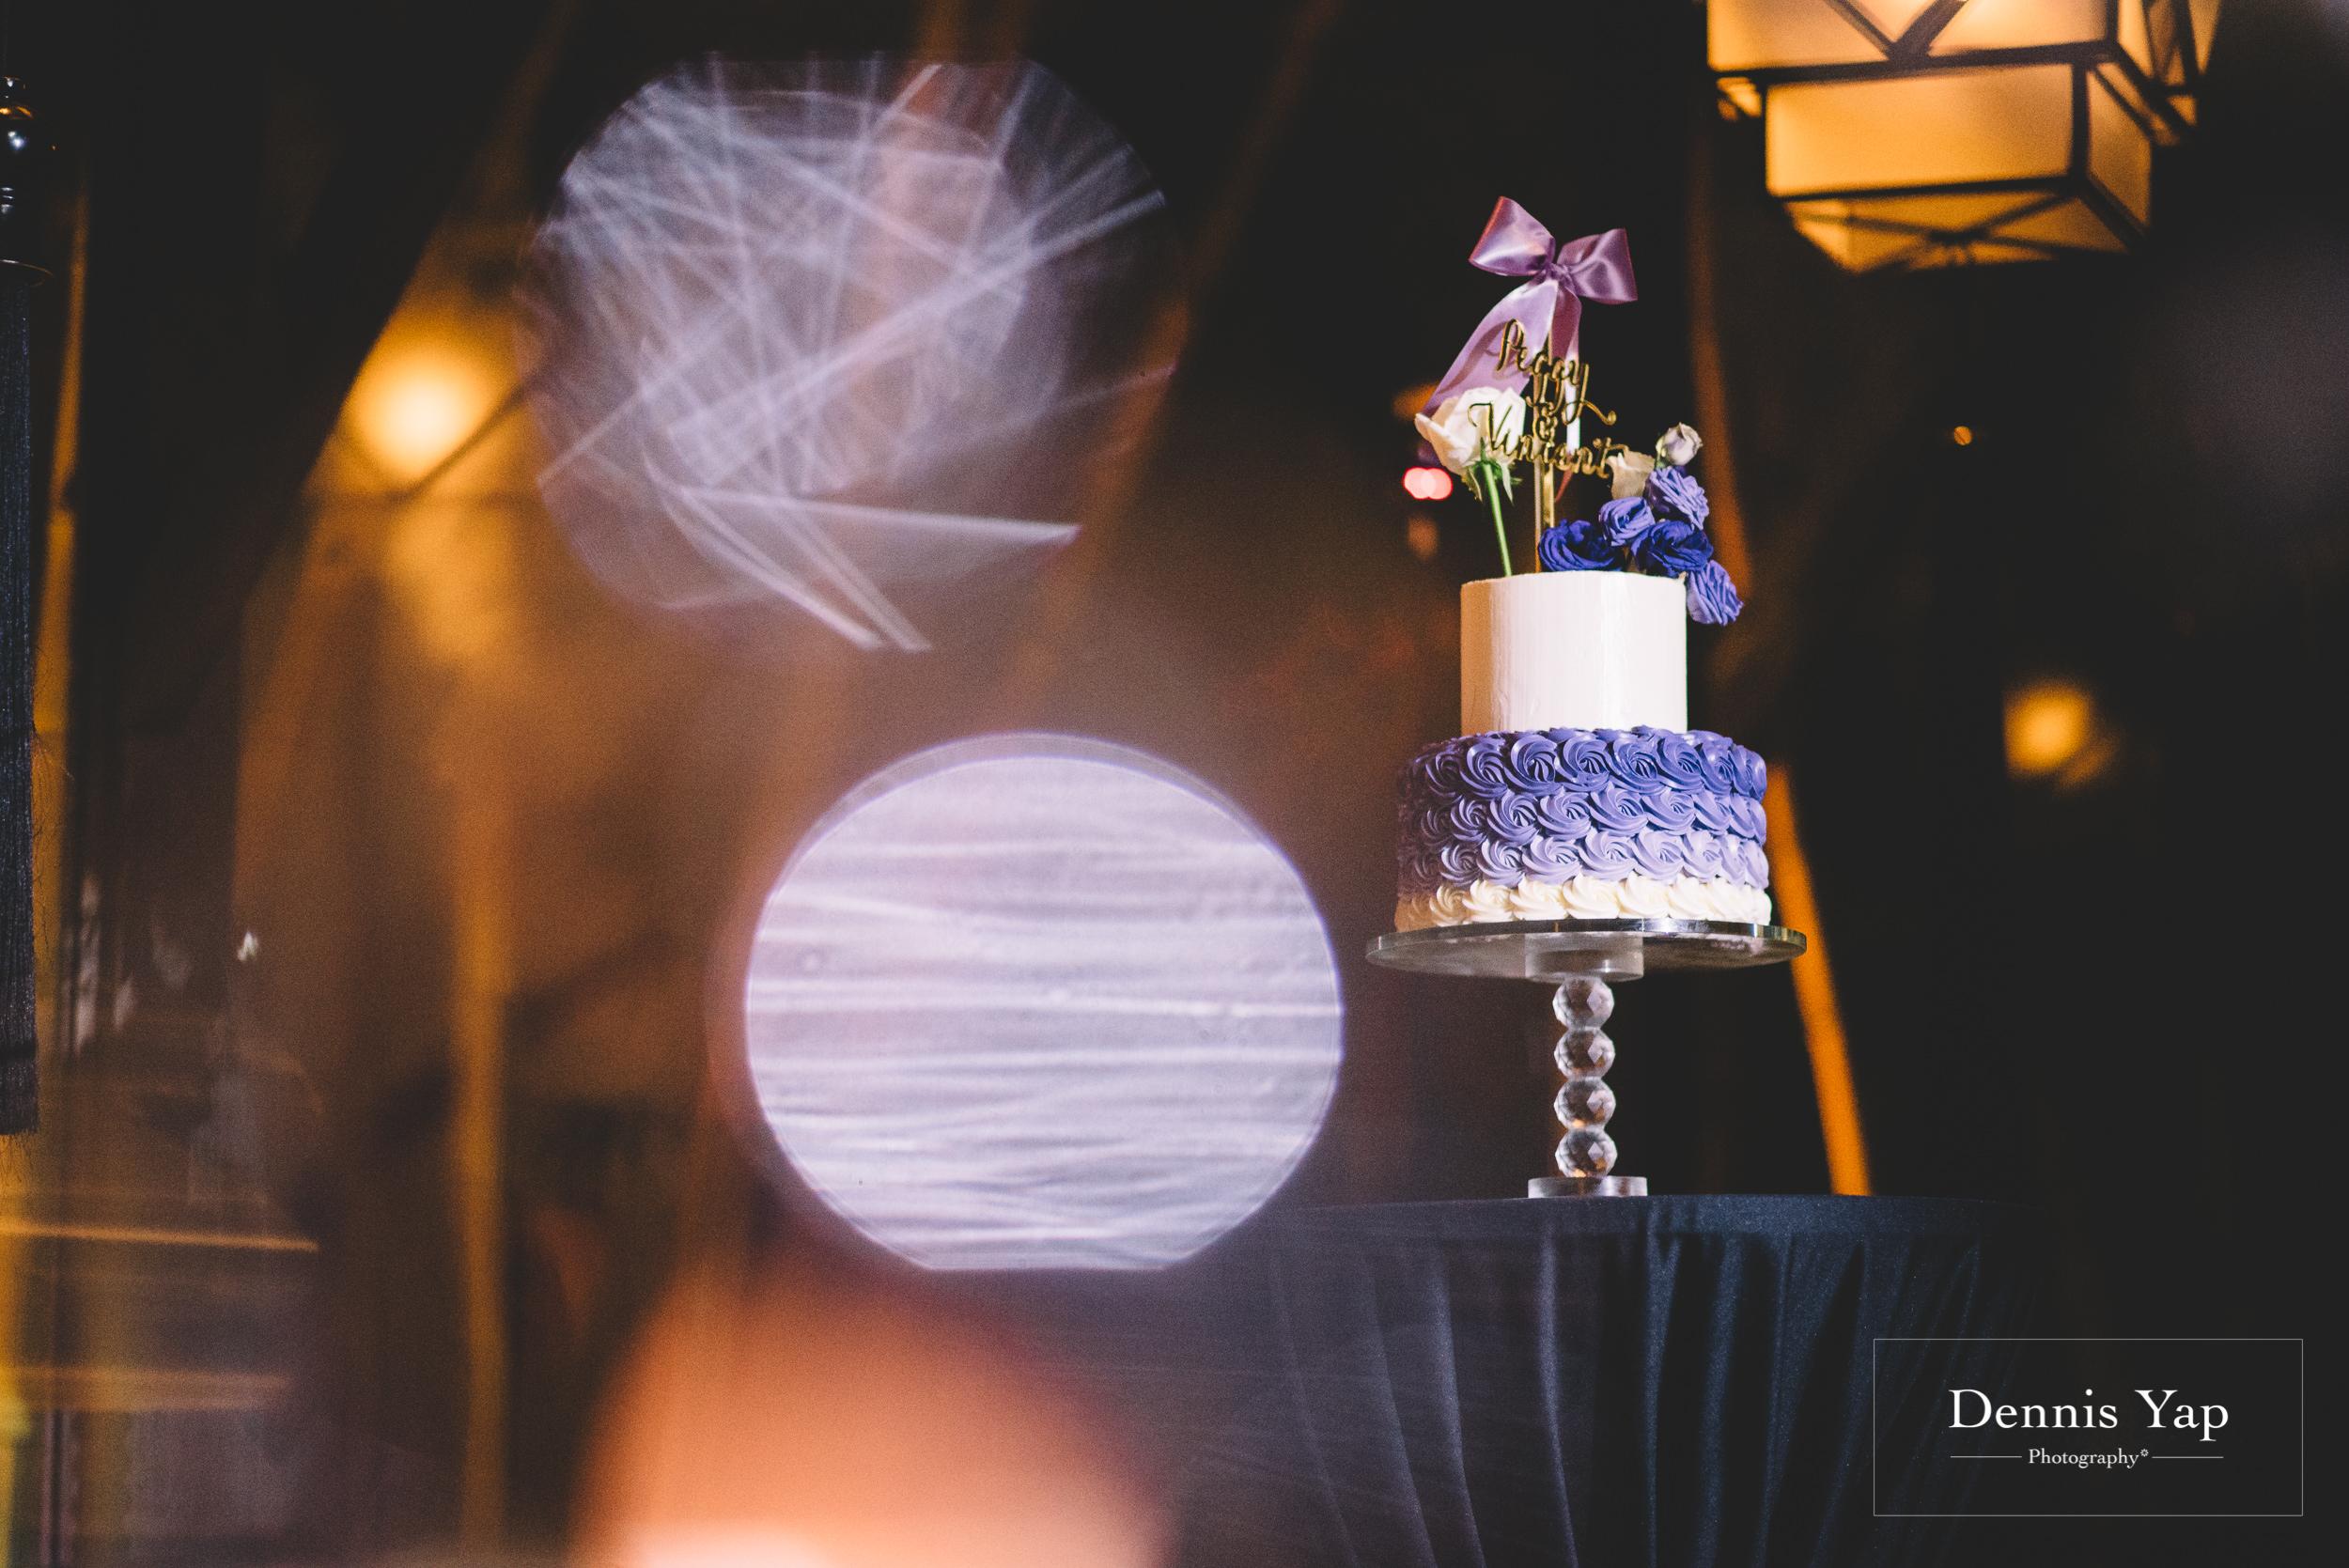 vincent peggy wedding dinner neo tamarind kuala lumpur dennis yap photography-26.jpg